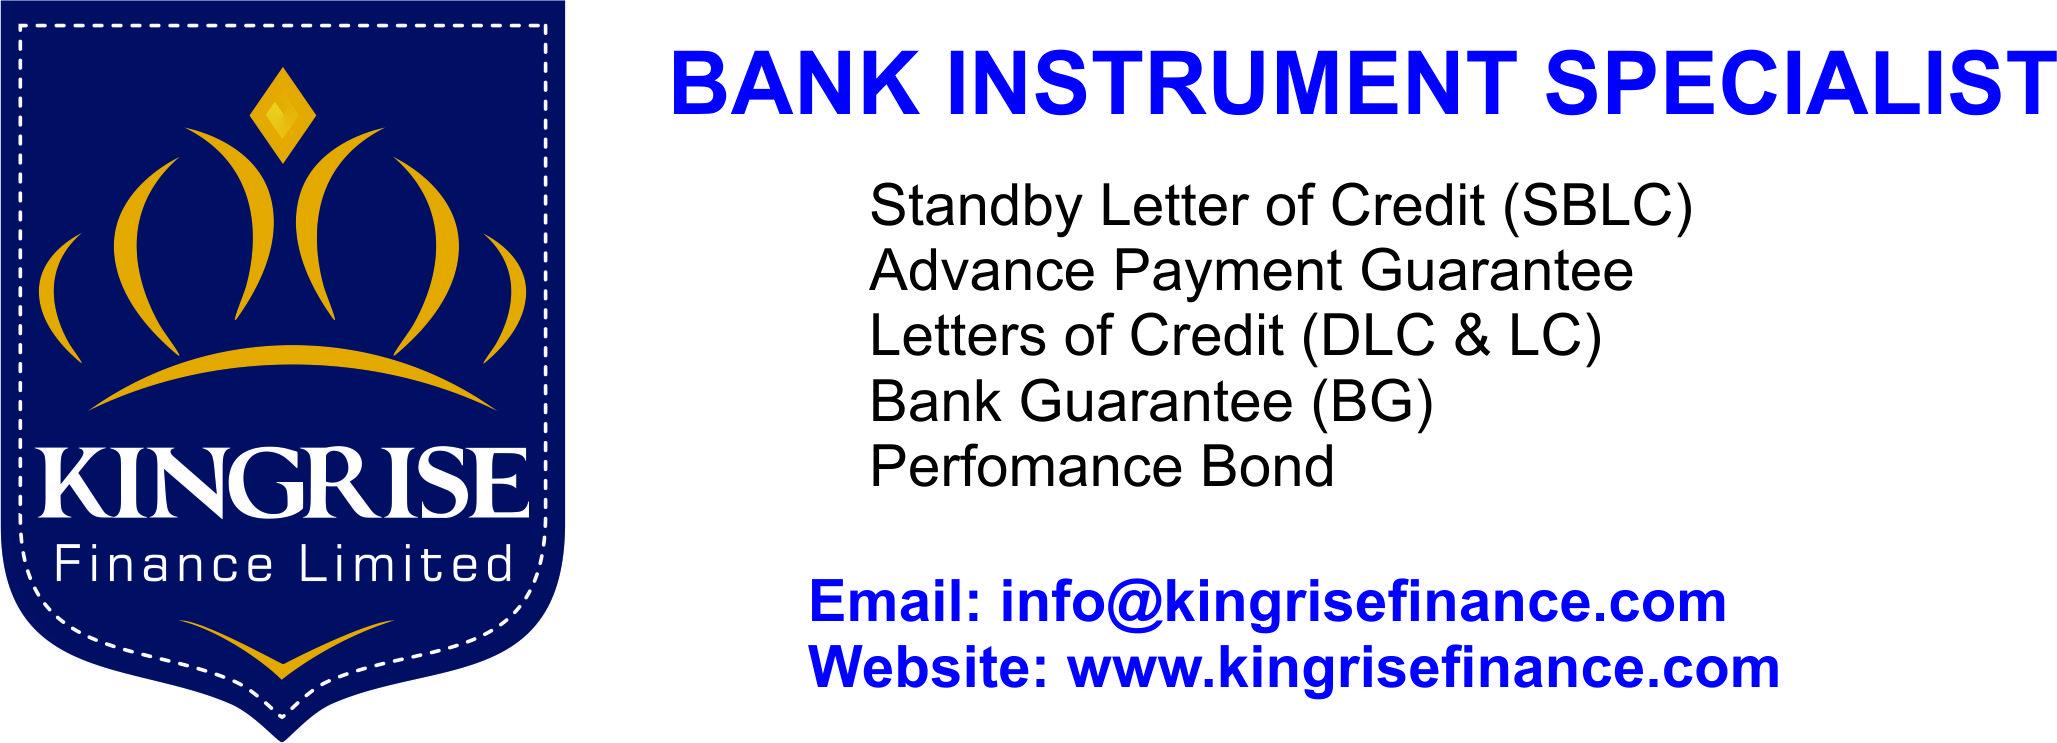 Providers Of Bank Instruments (BG/SBLC) | Kingrise Finance Limited